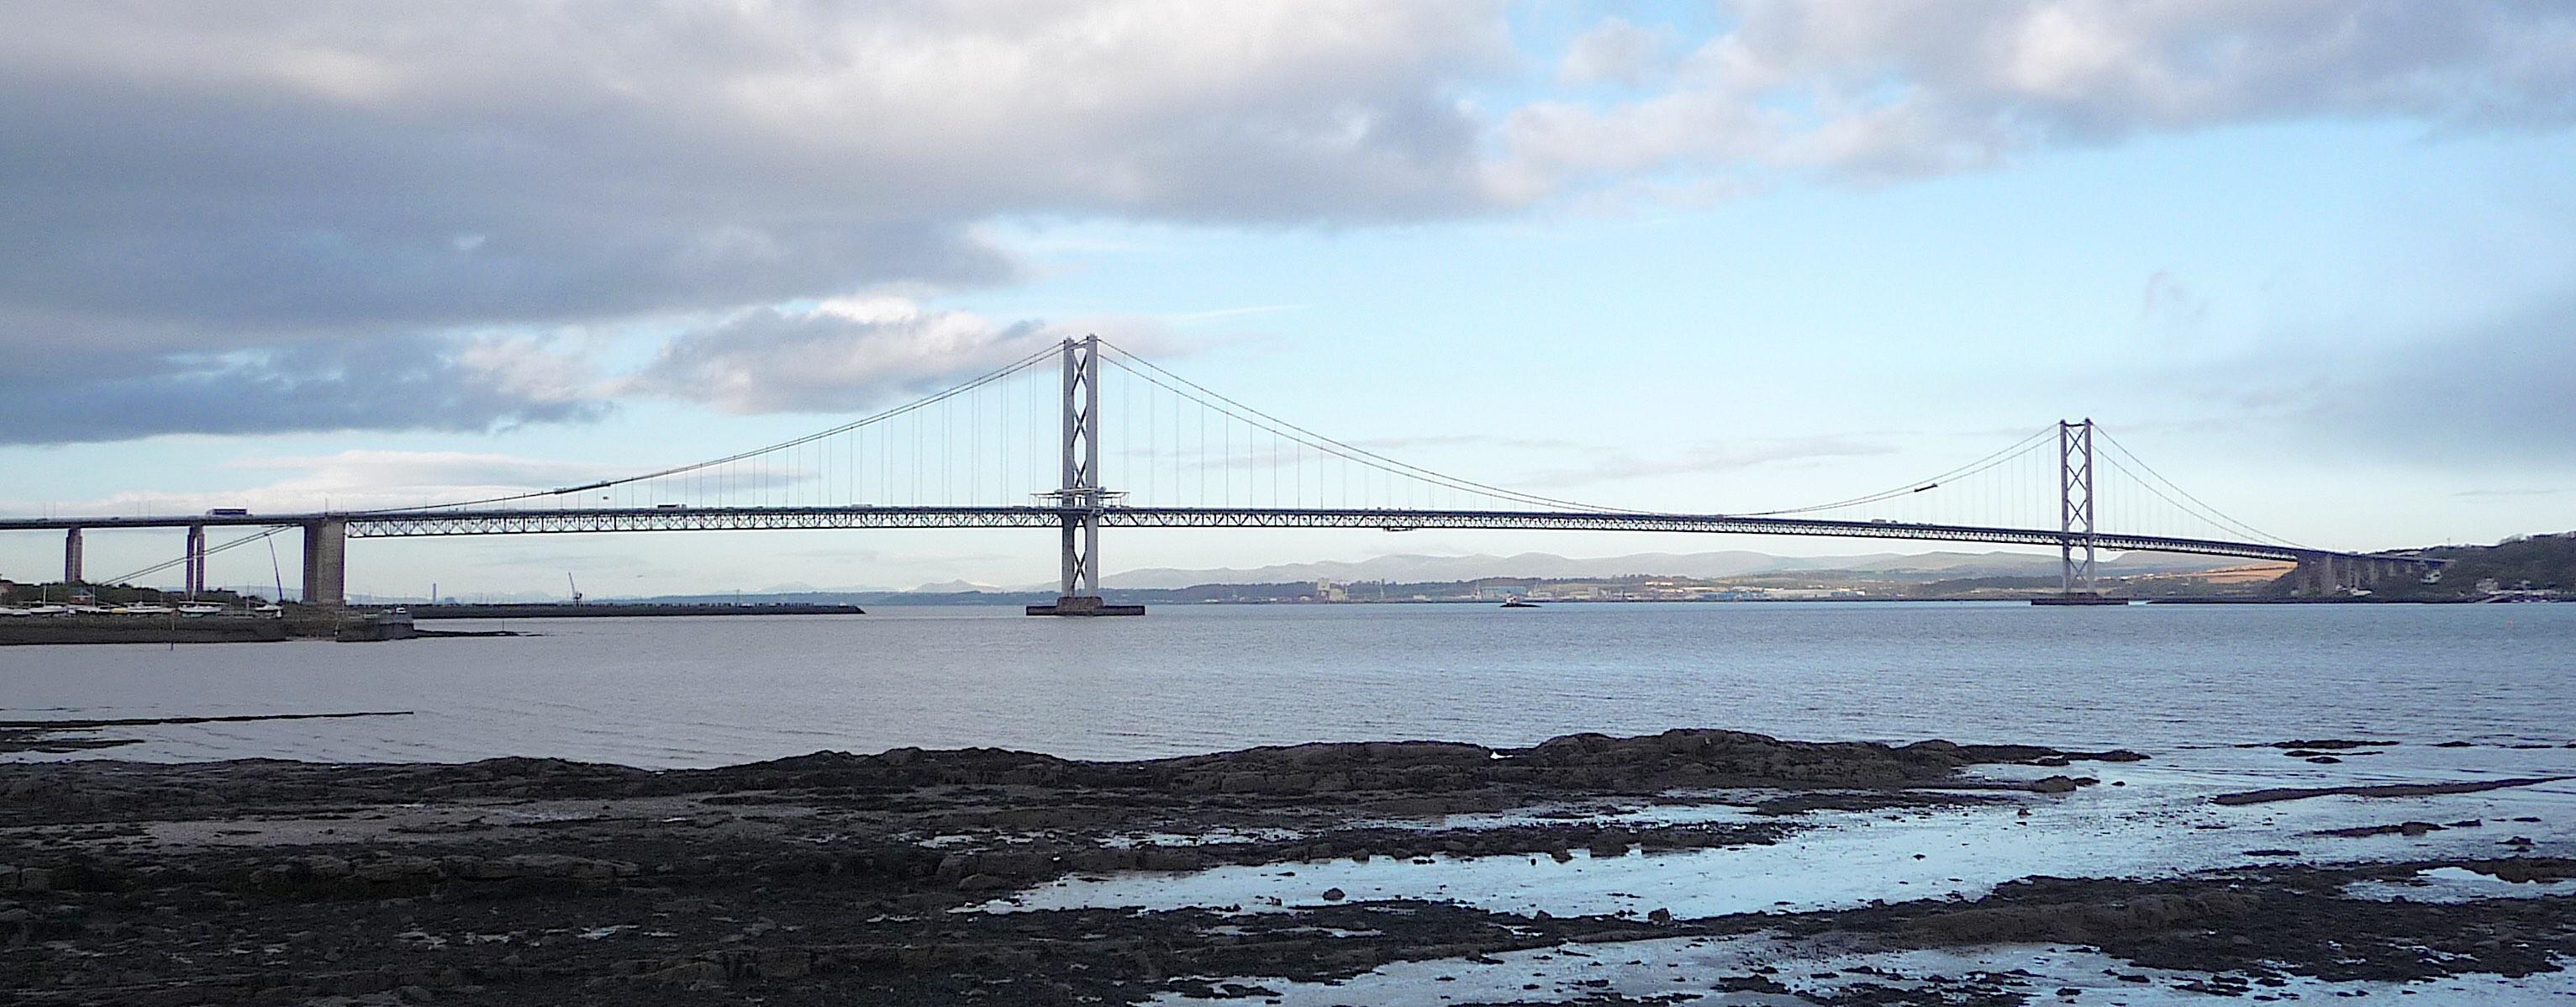 32.Forth Road Bridge